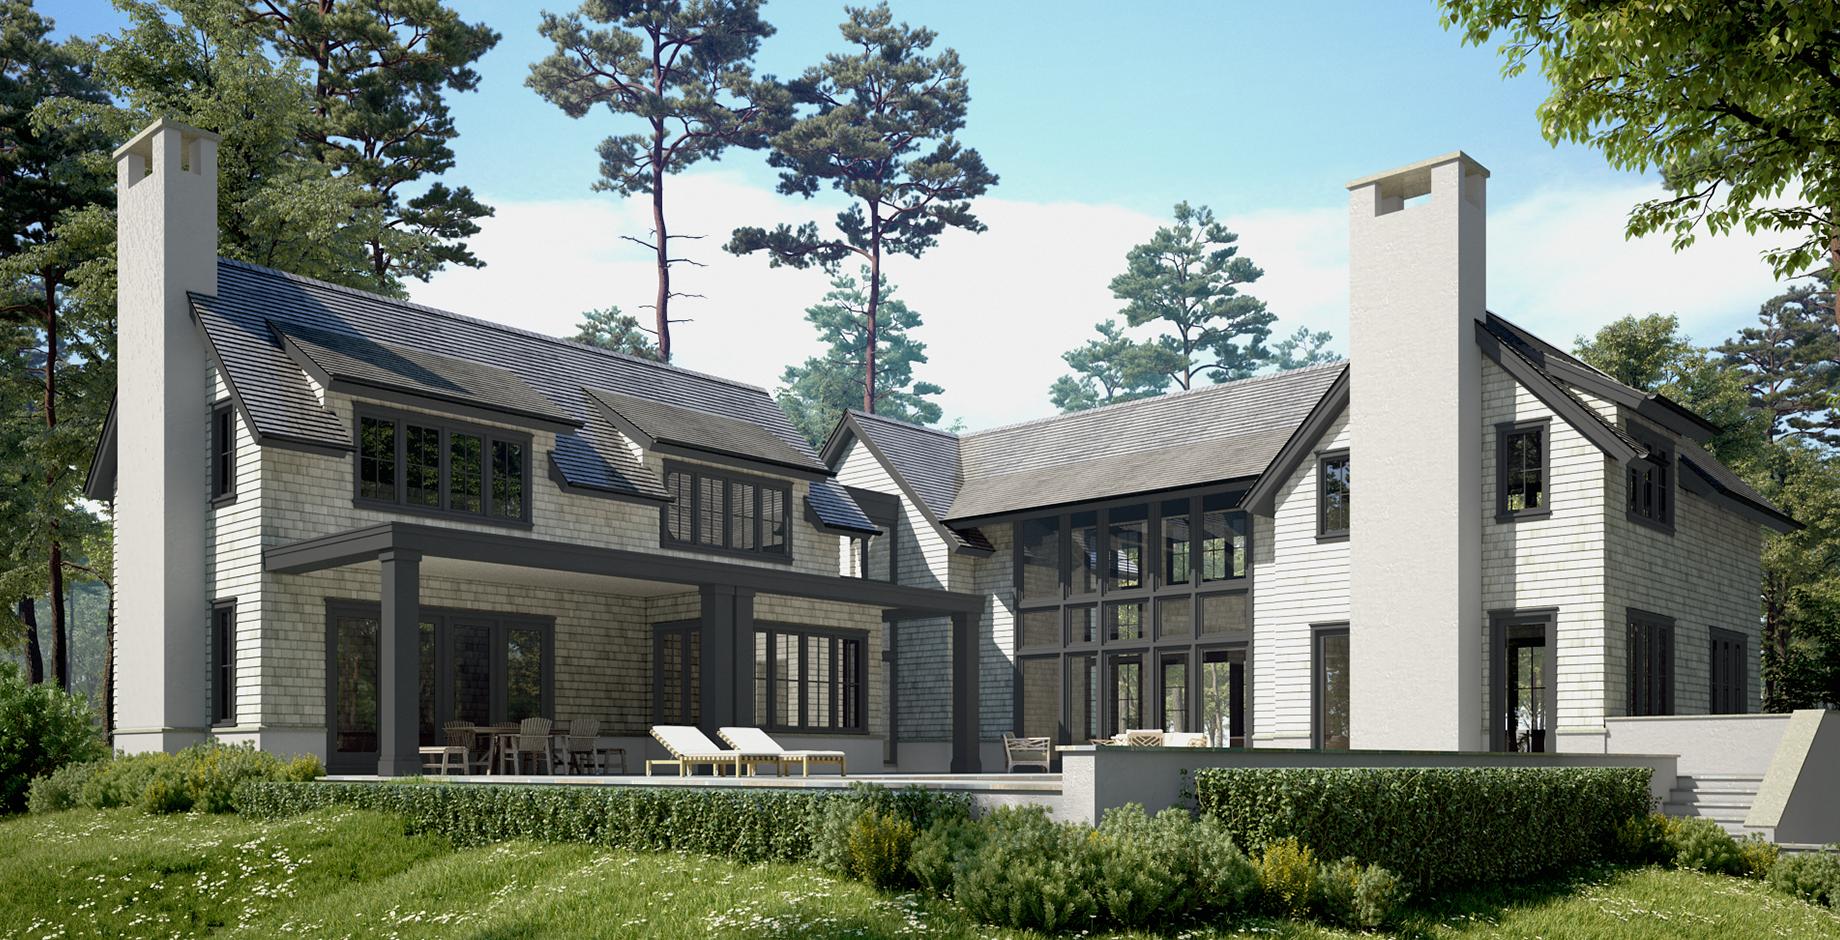 Modern Farm House Style Home in Progress